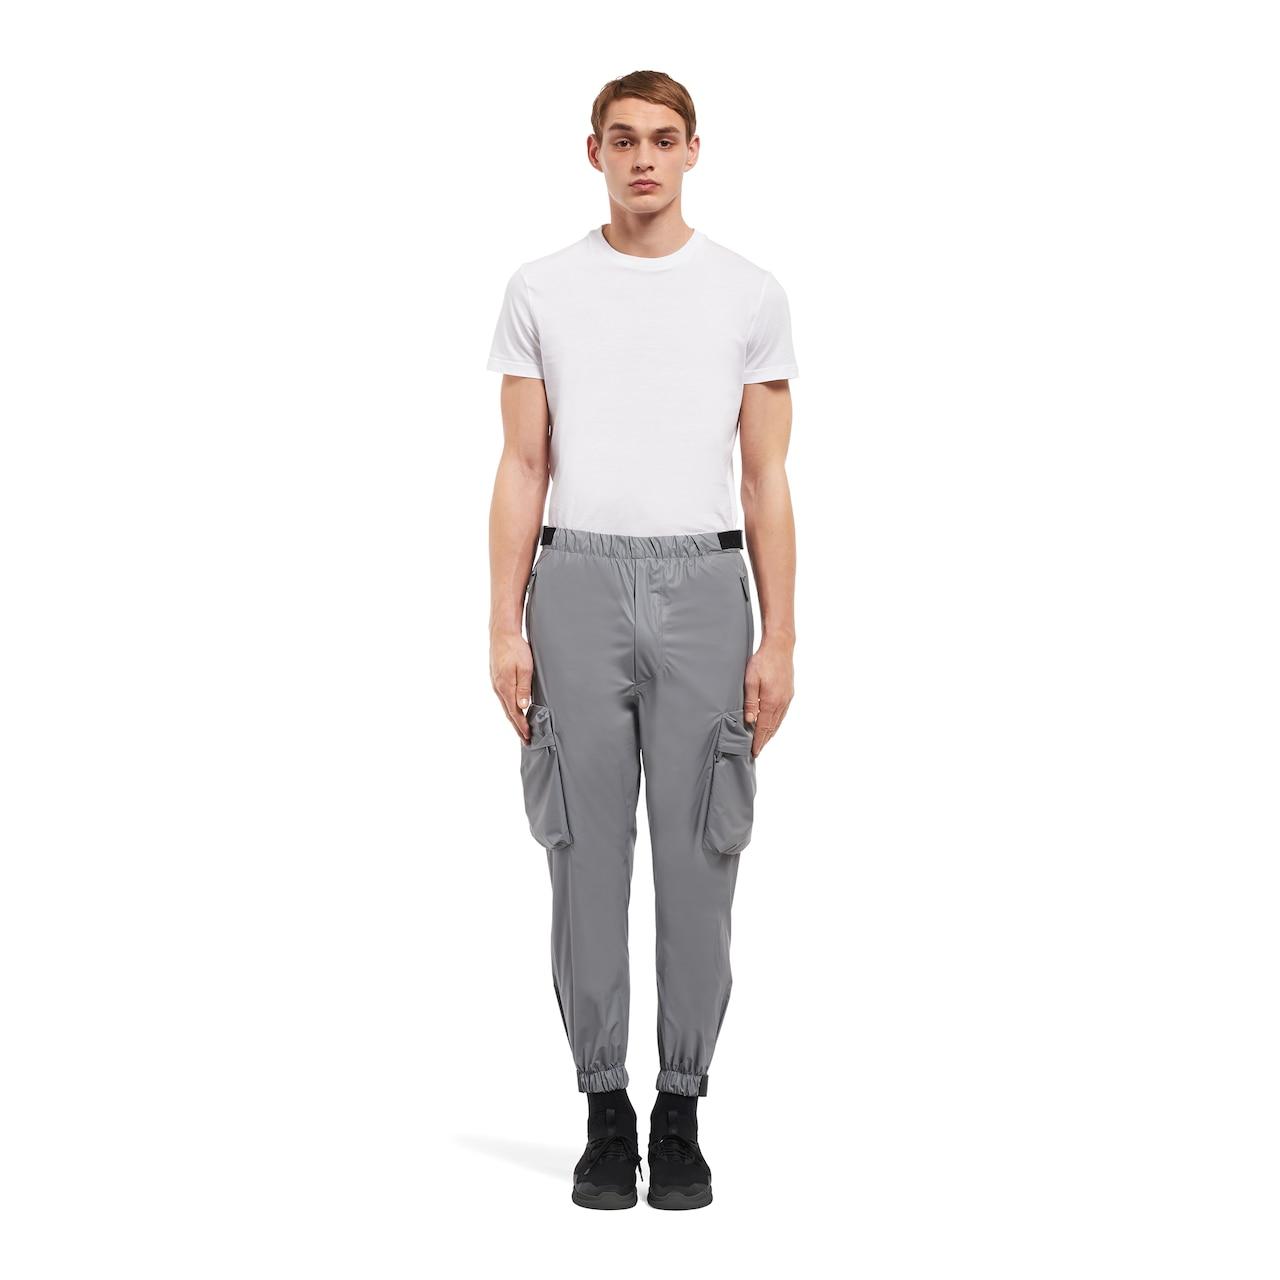 Prada LR-LX025 尼龙长裤 2